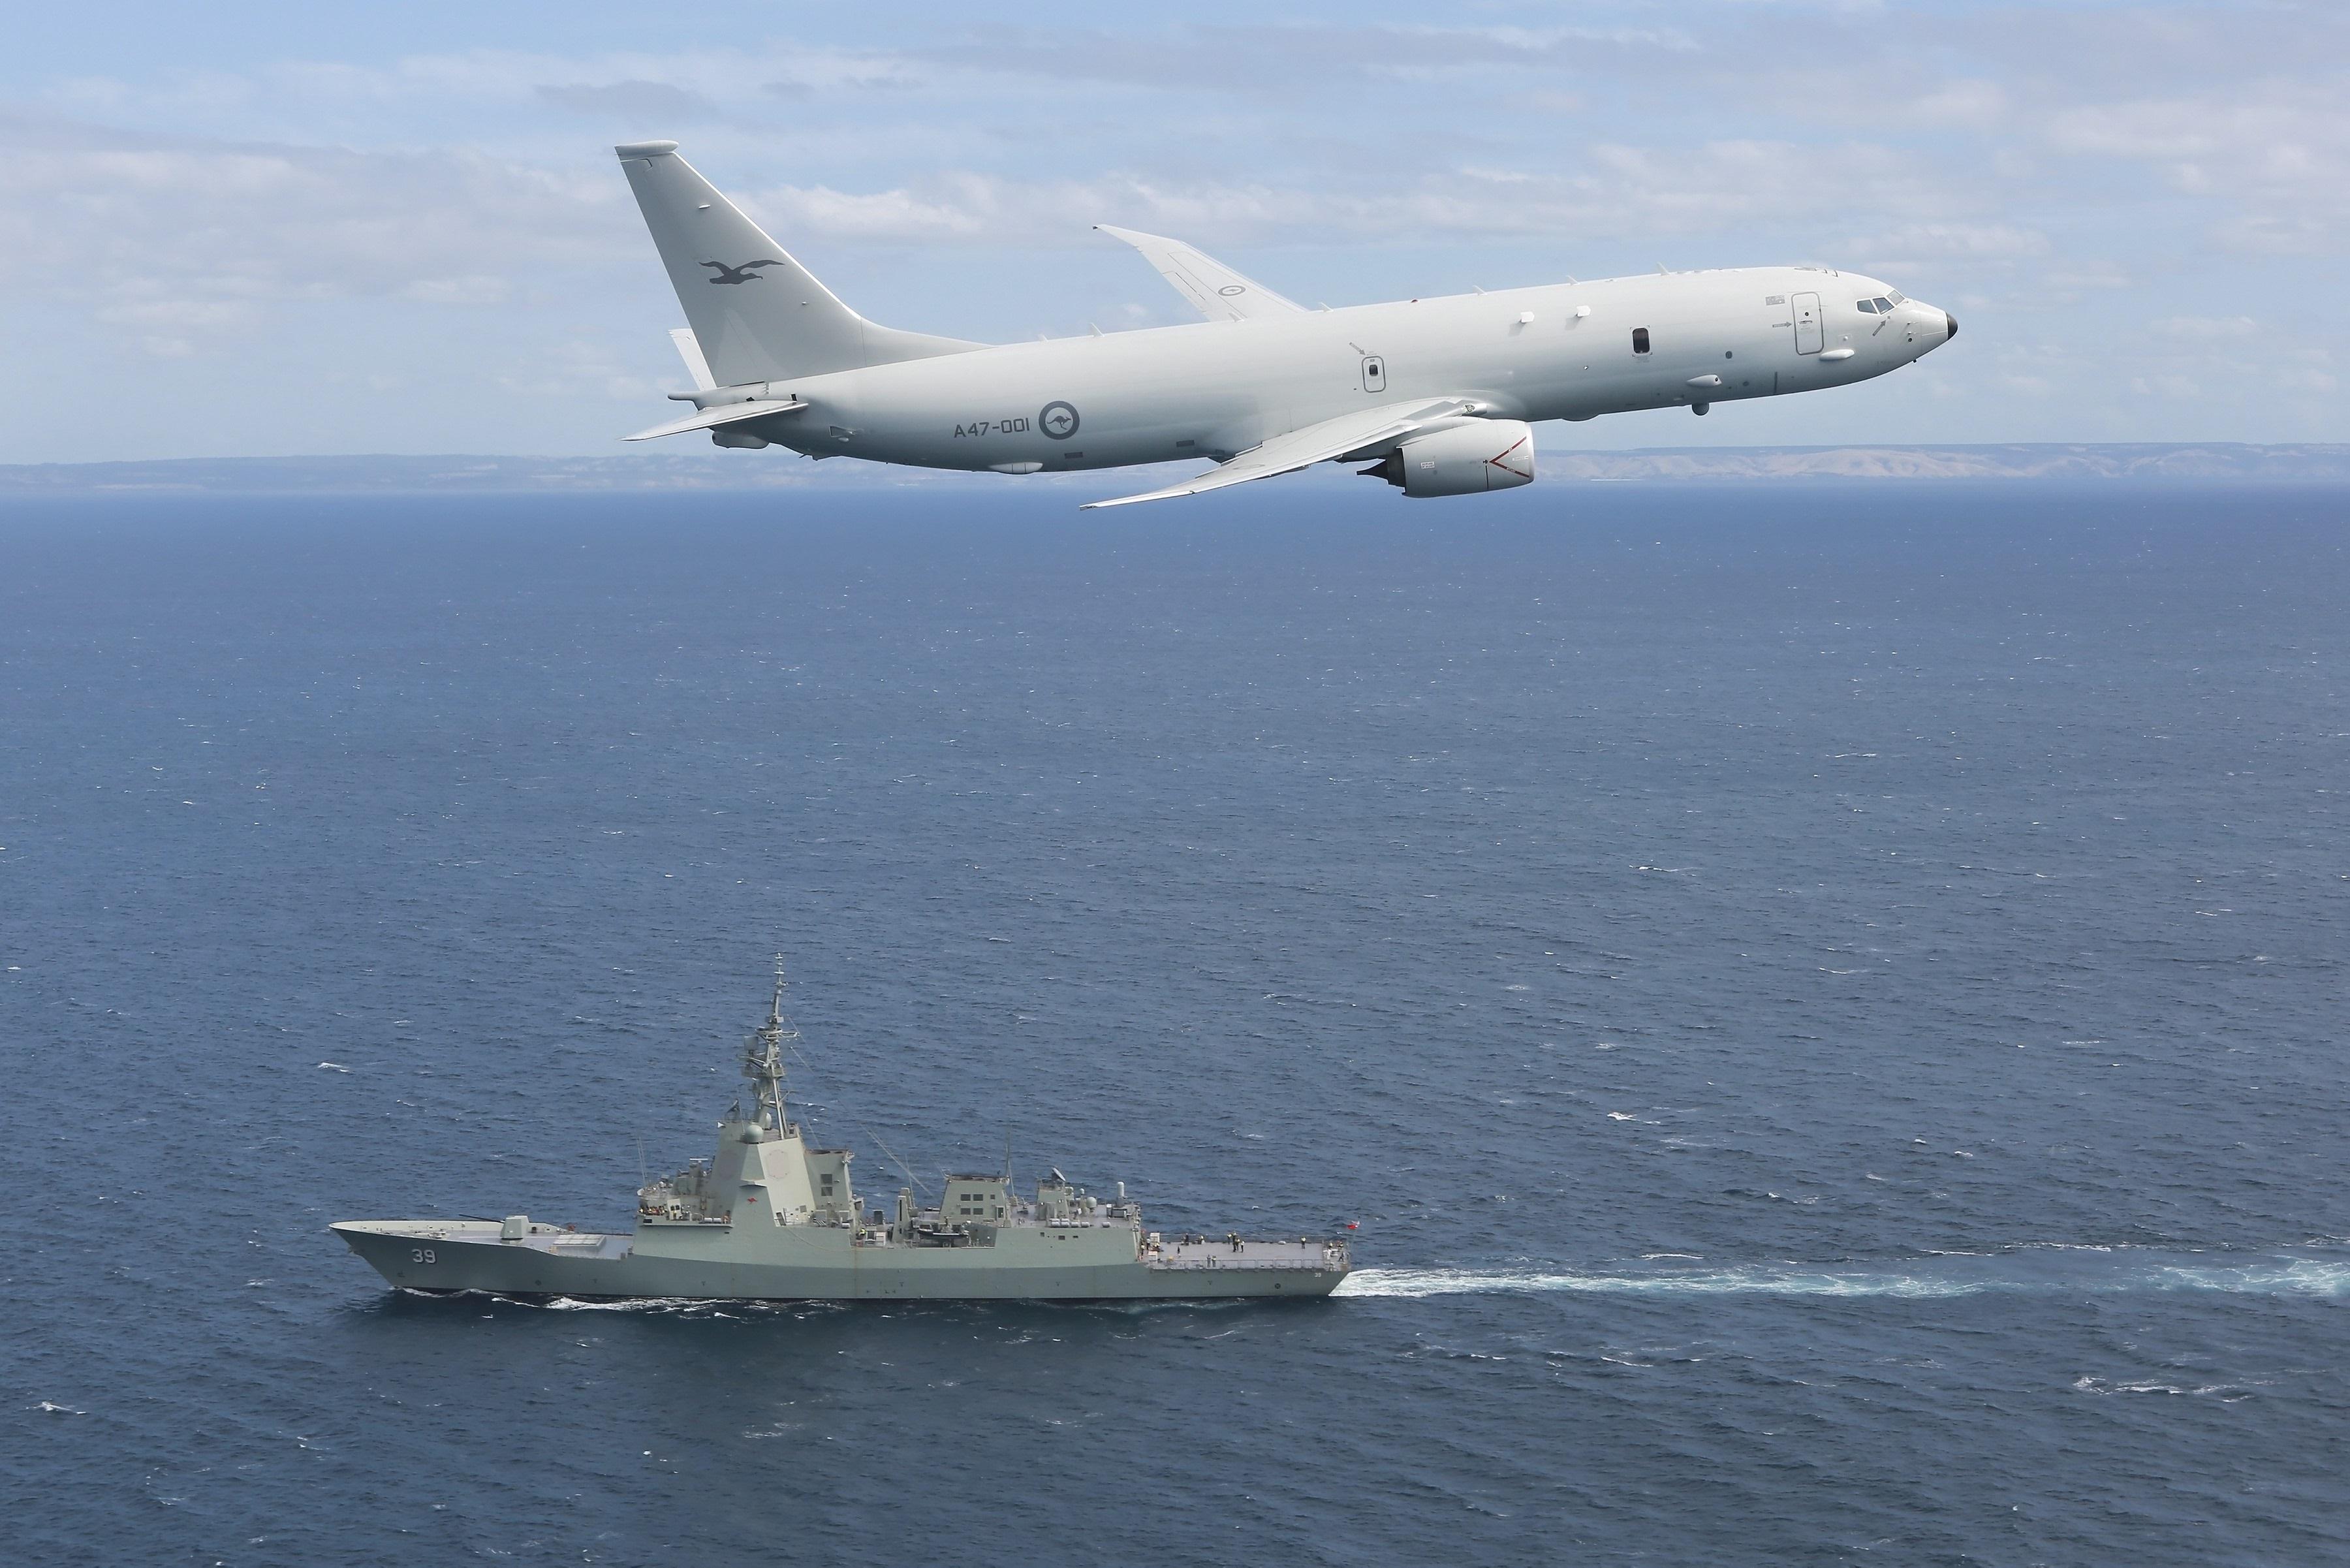 Royal Australian Air Force Boeing P-8A Poseidon Maritime Patrol Aircraft